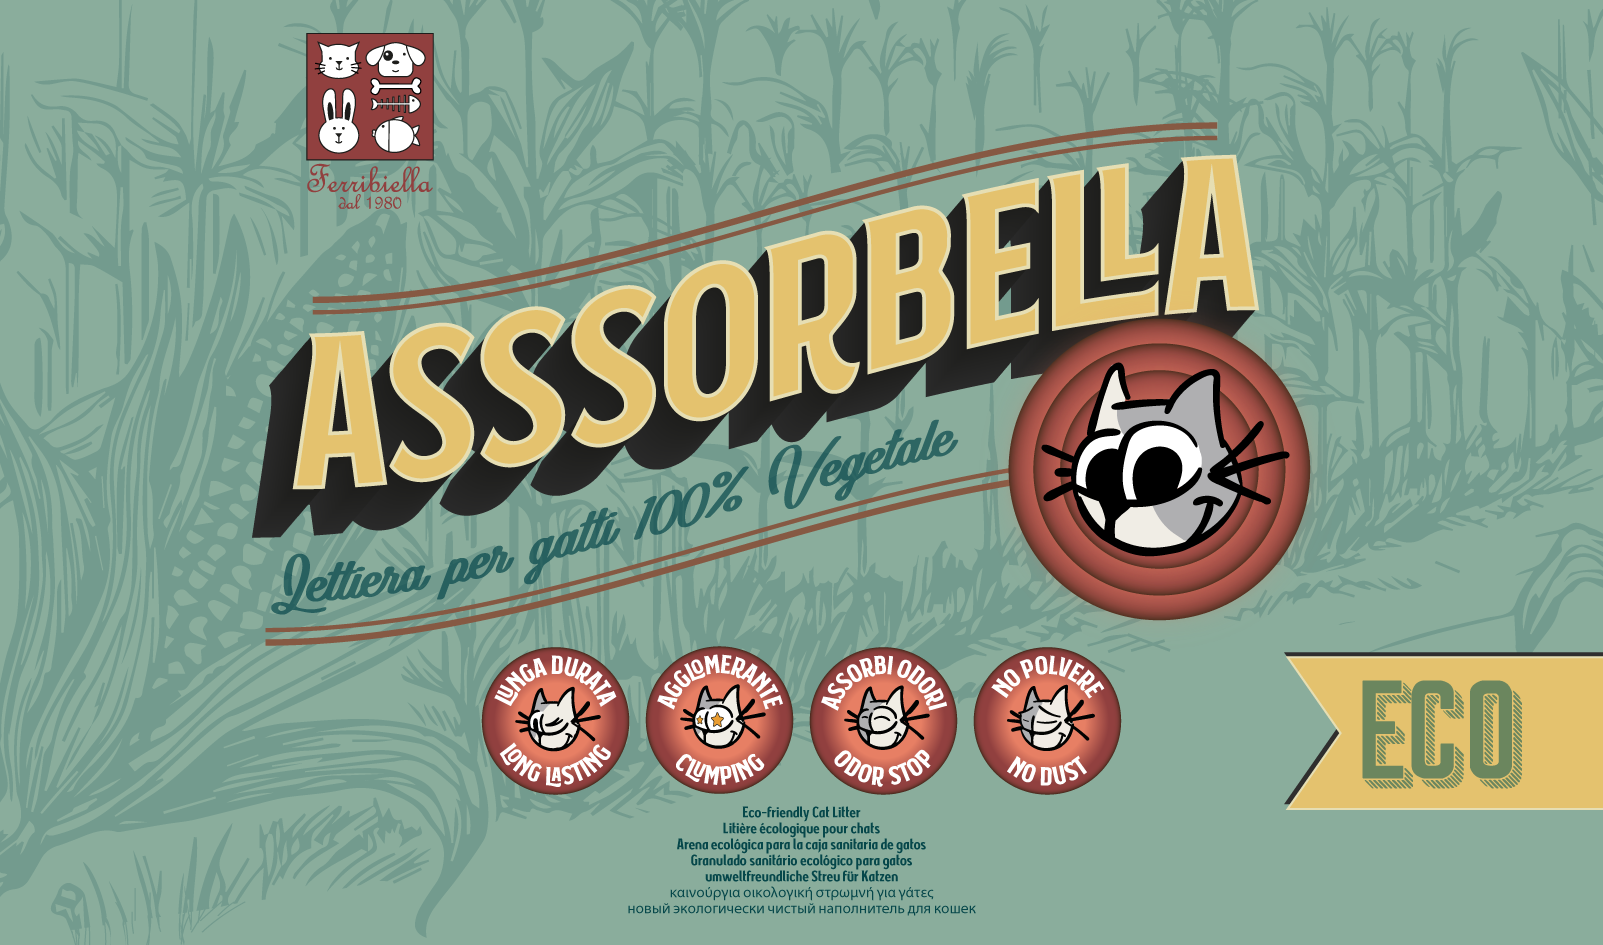 Asssorbella